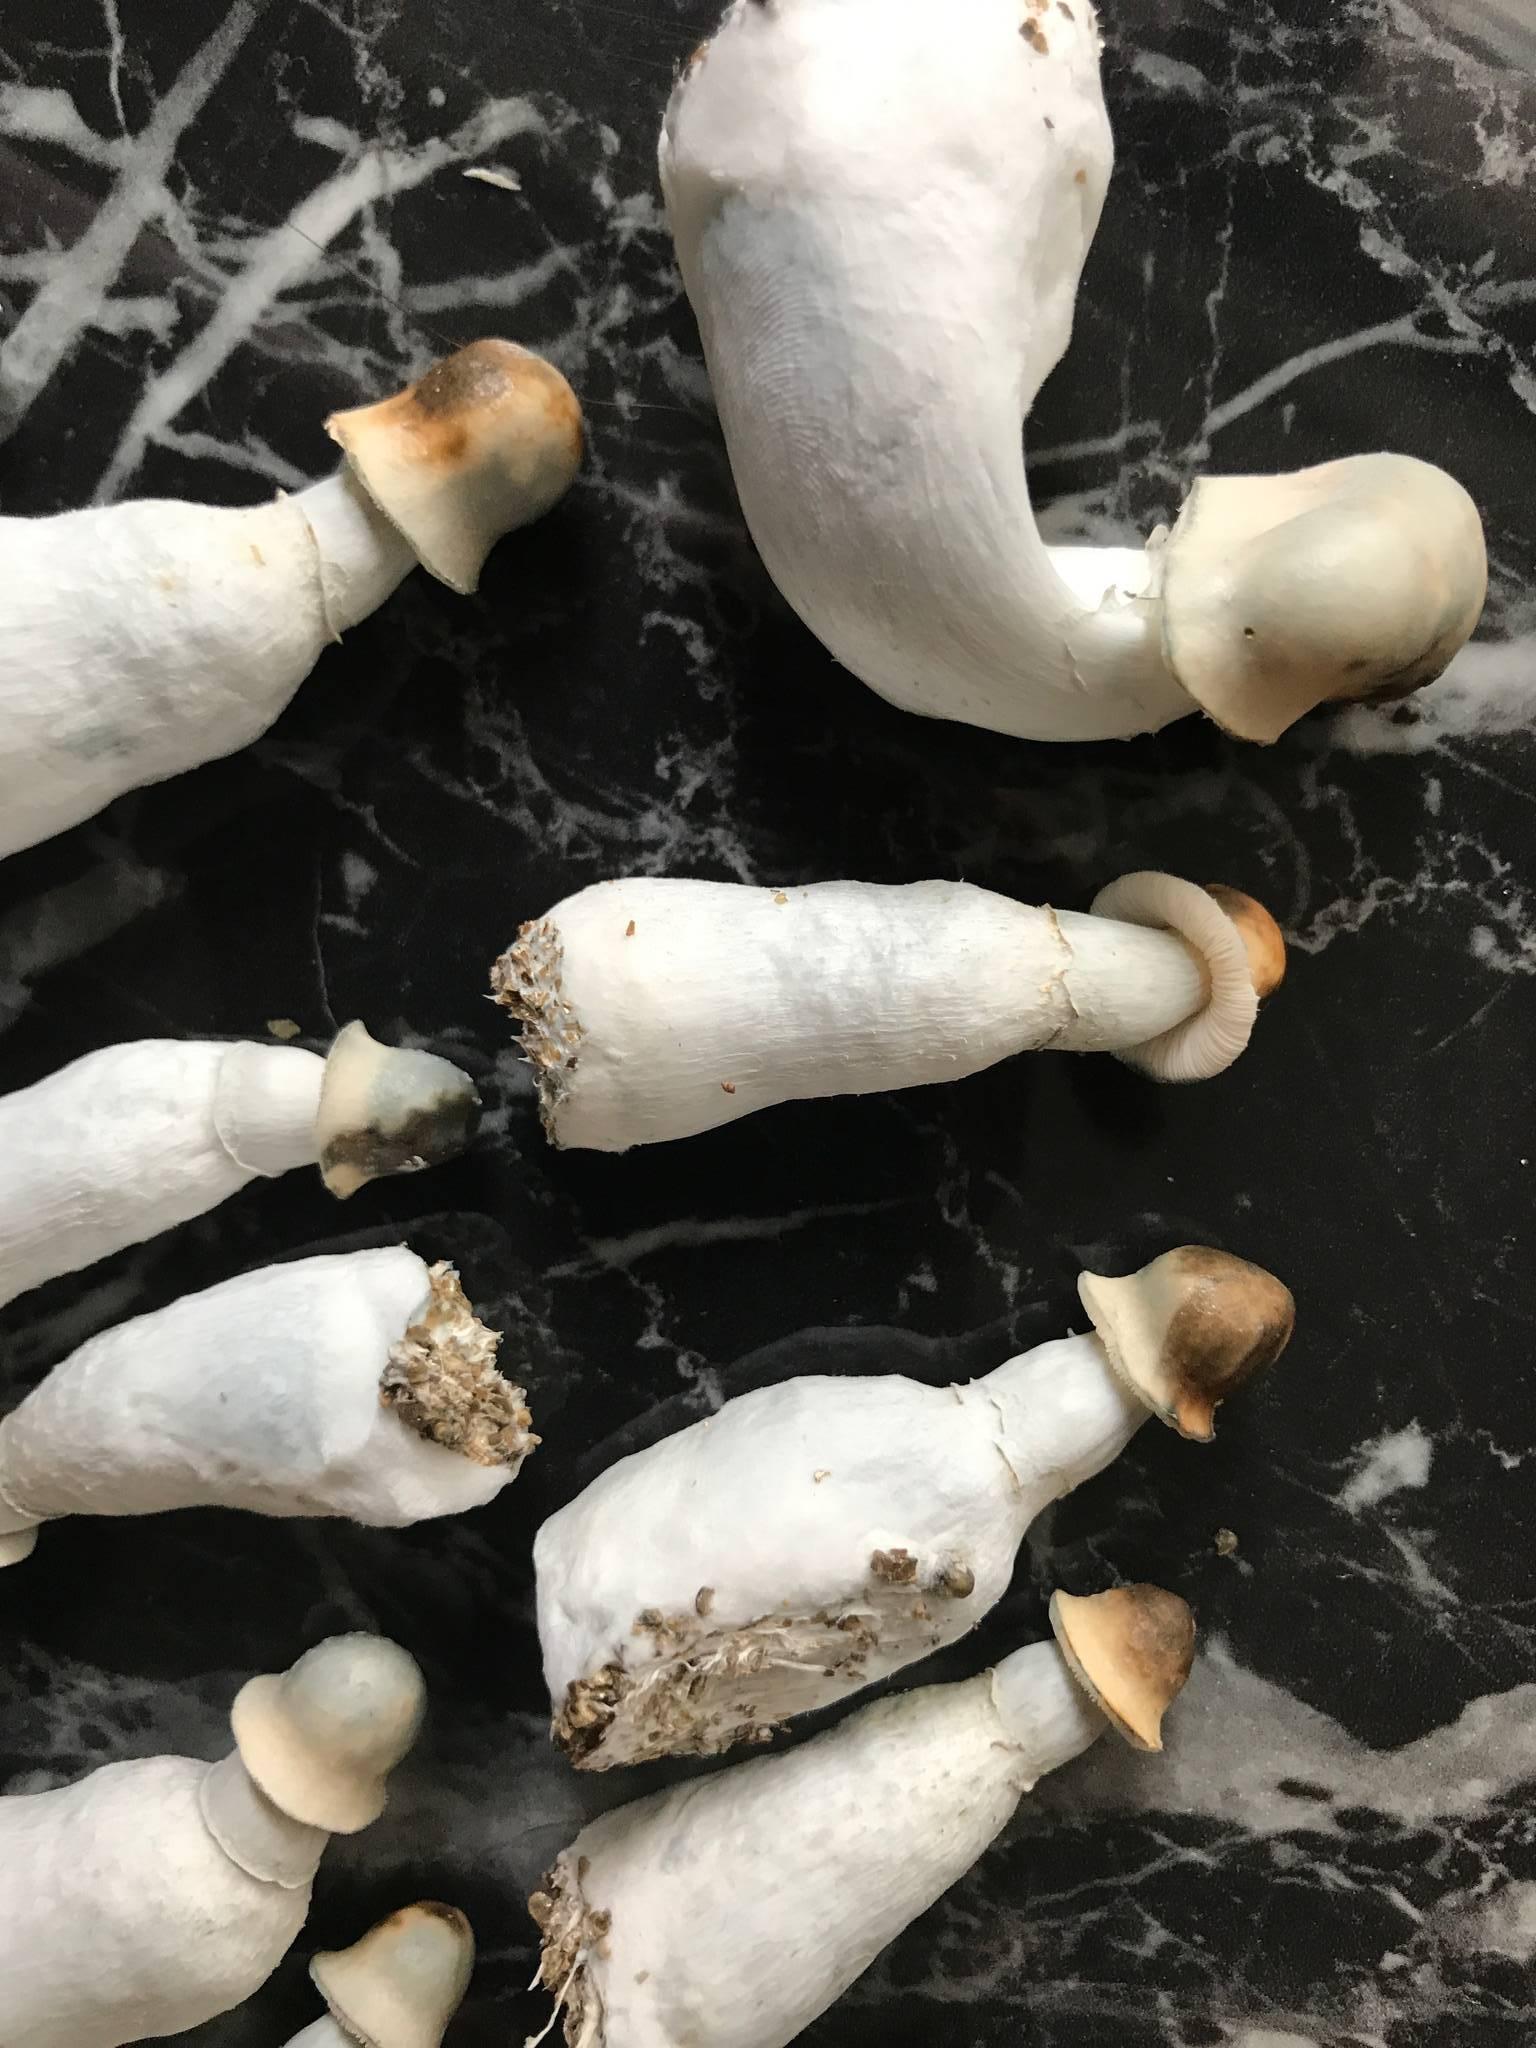 Are these contaminated? - Contamination Forum - Shroomery